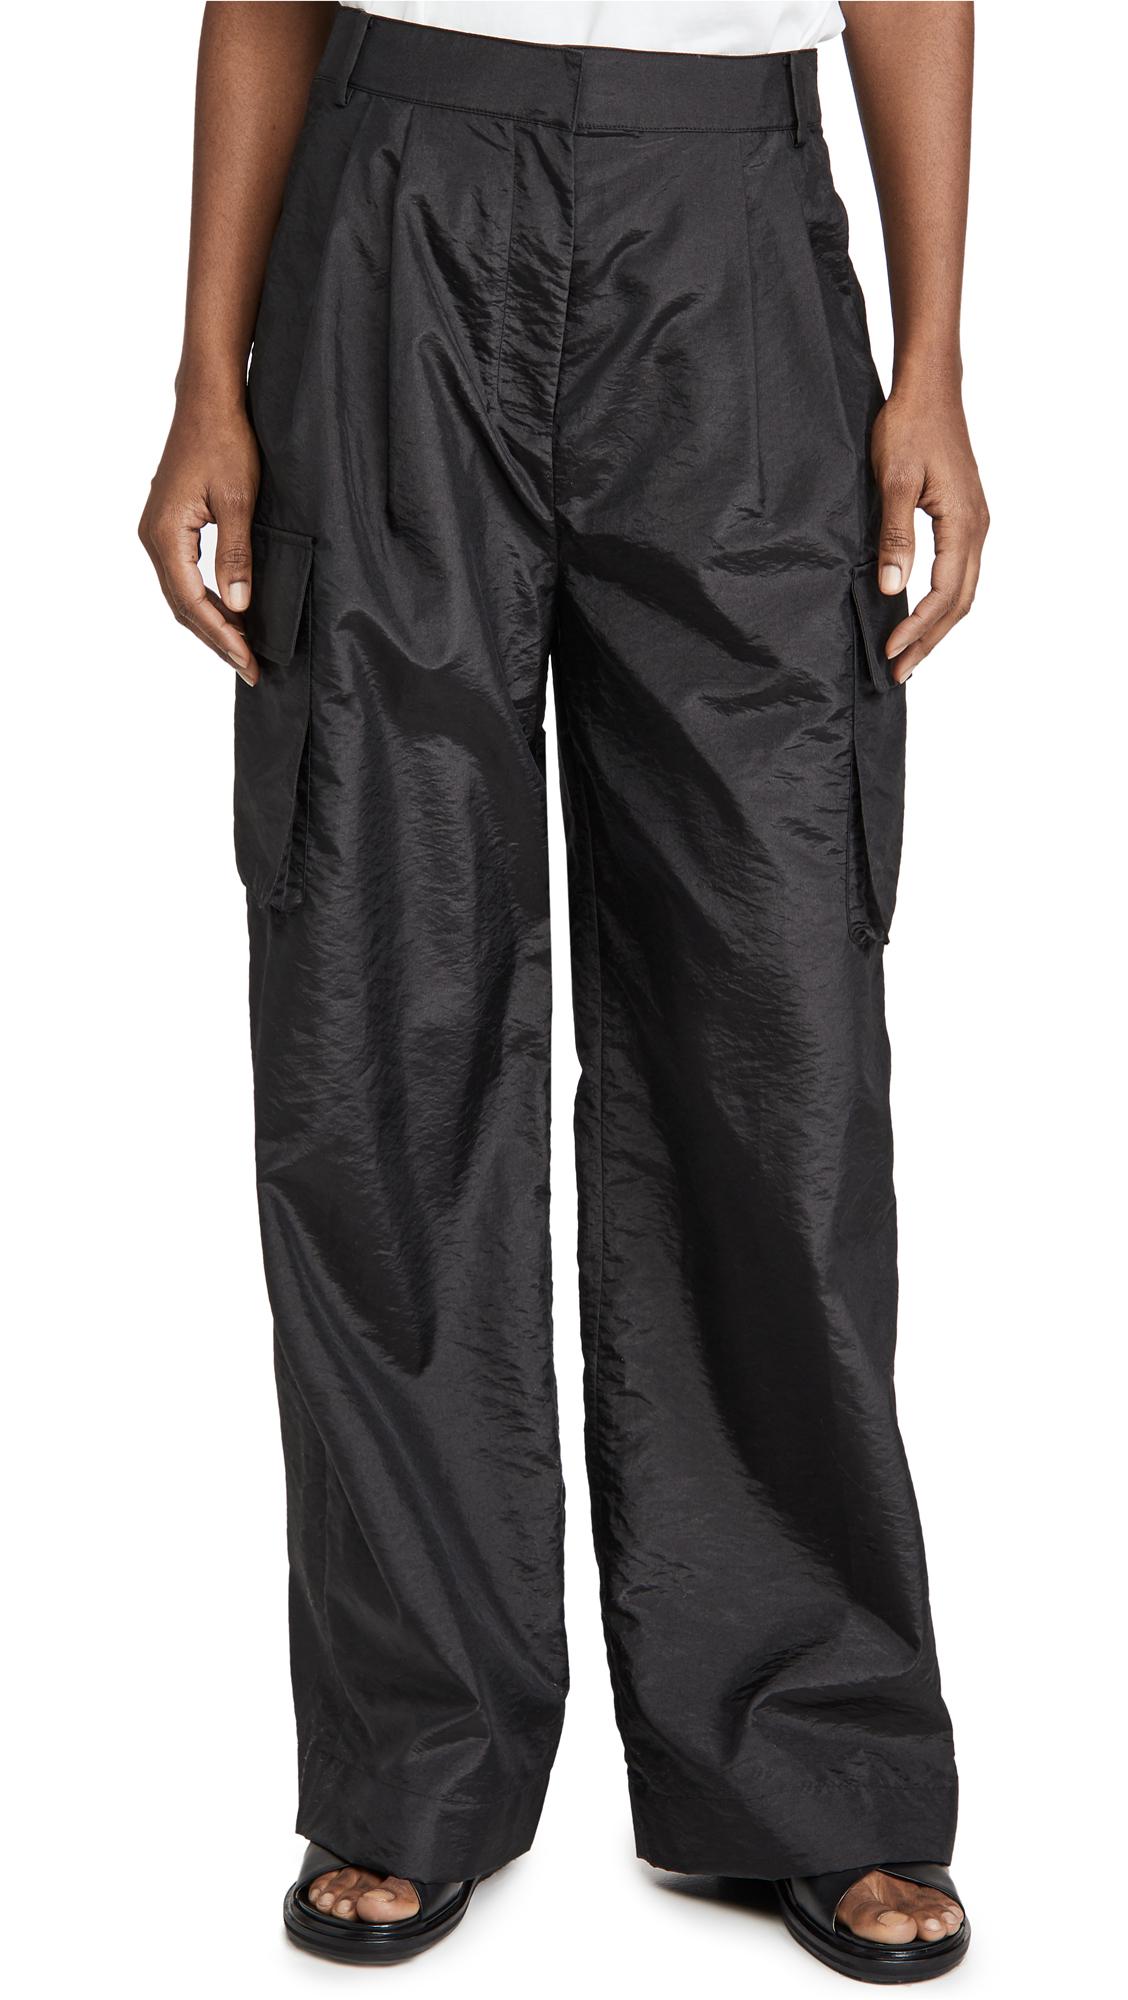 Tibi Crispy Nylon Pleated Cargo Pants